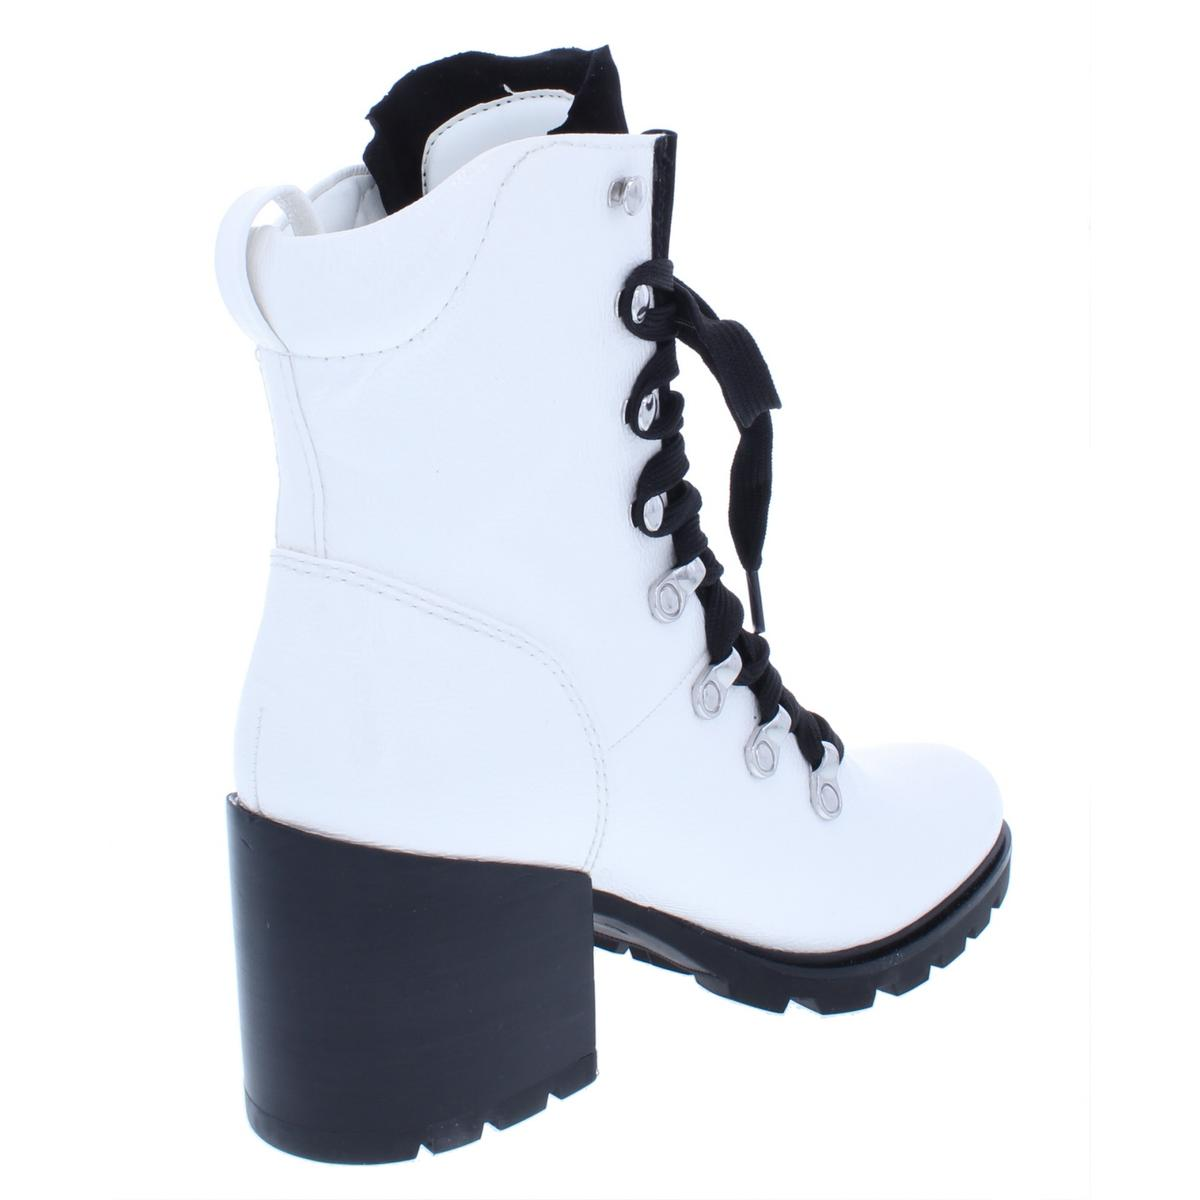 Kendall + Kylie para mujer Spencer Spencer mujer 4 Charol botas Zapatos de combate BHFO 9077 9f5524